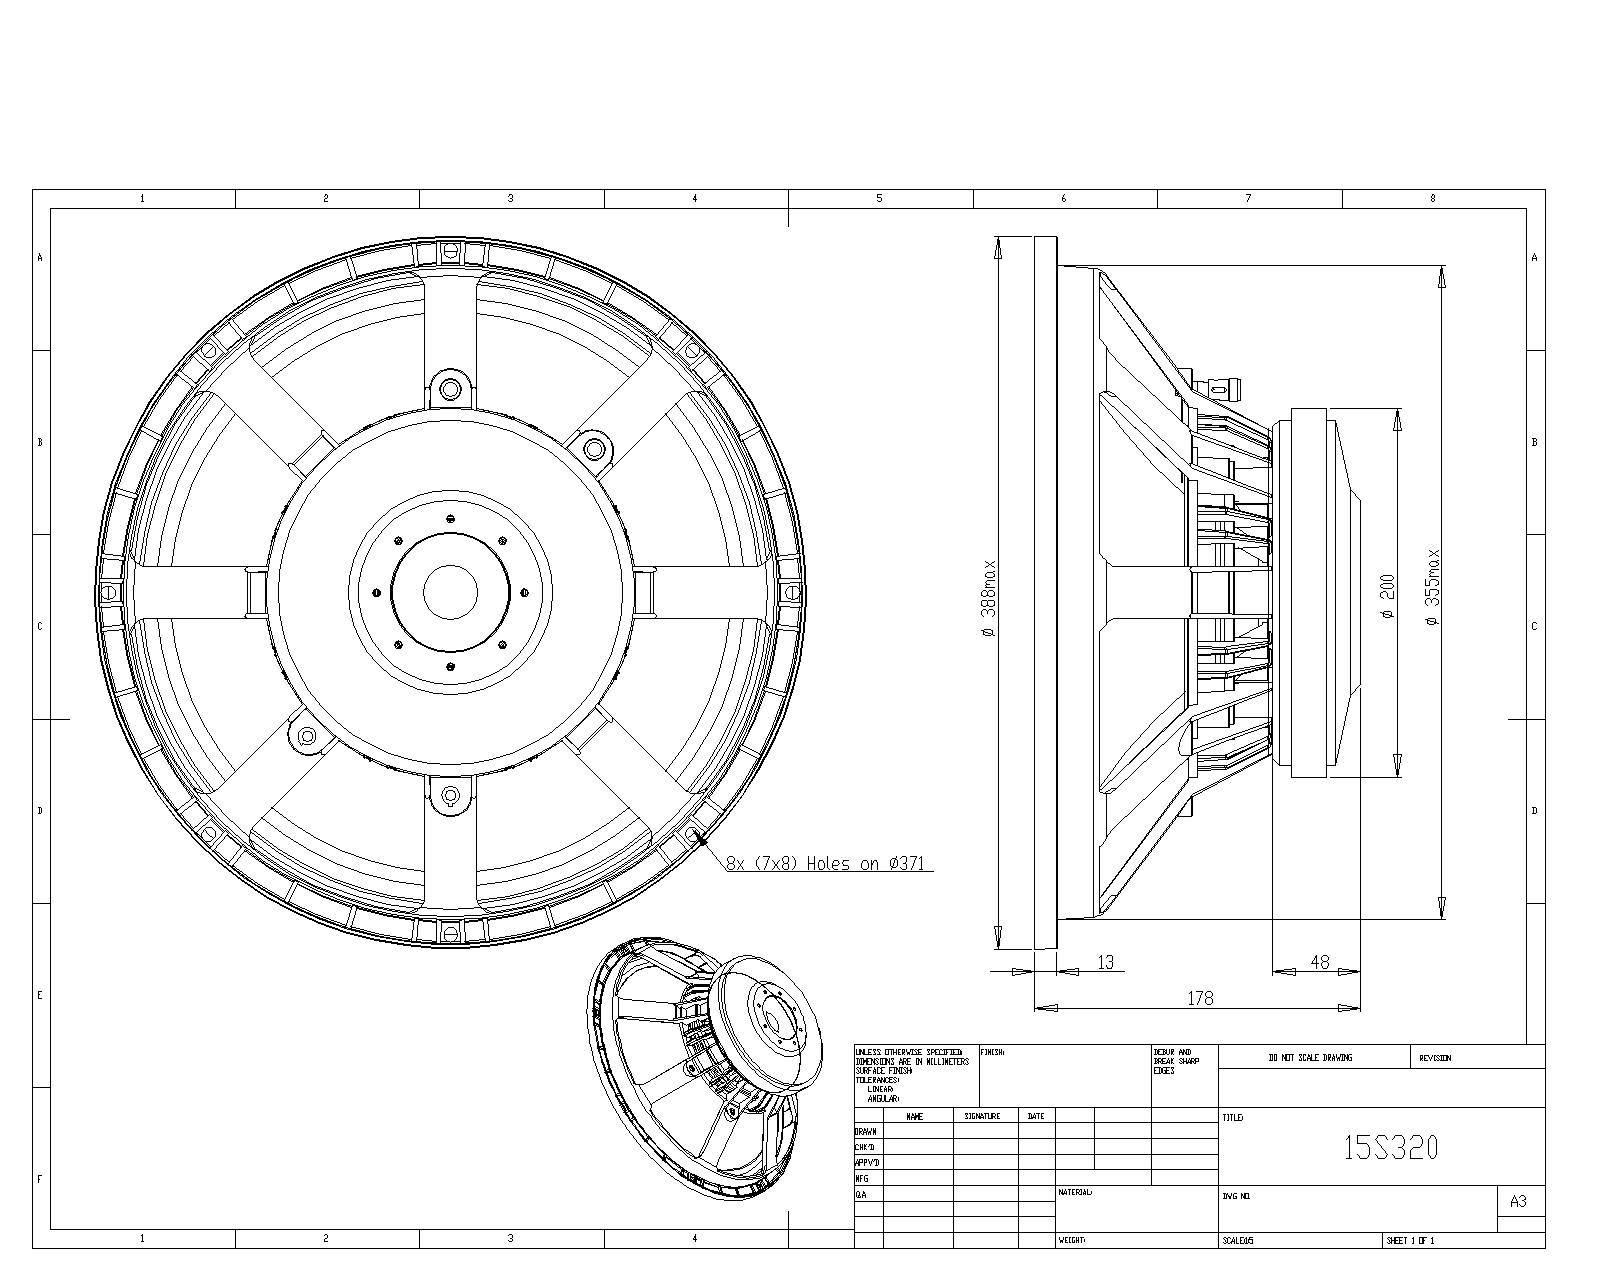 canon mx882 service manual ebook coupon codes images. Black Bedroom Furniture Sets. Home Design Ideas